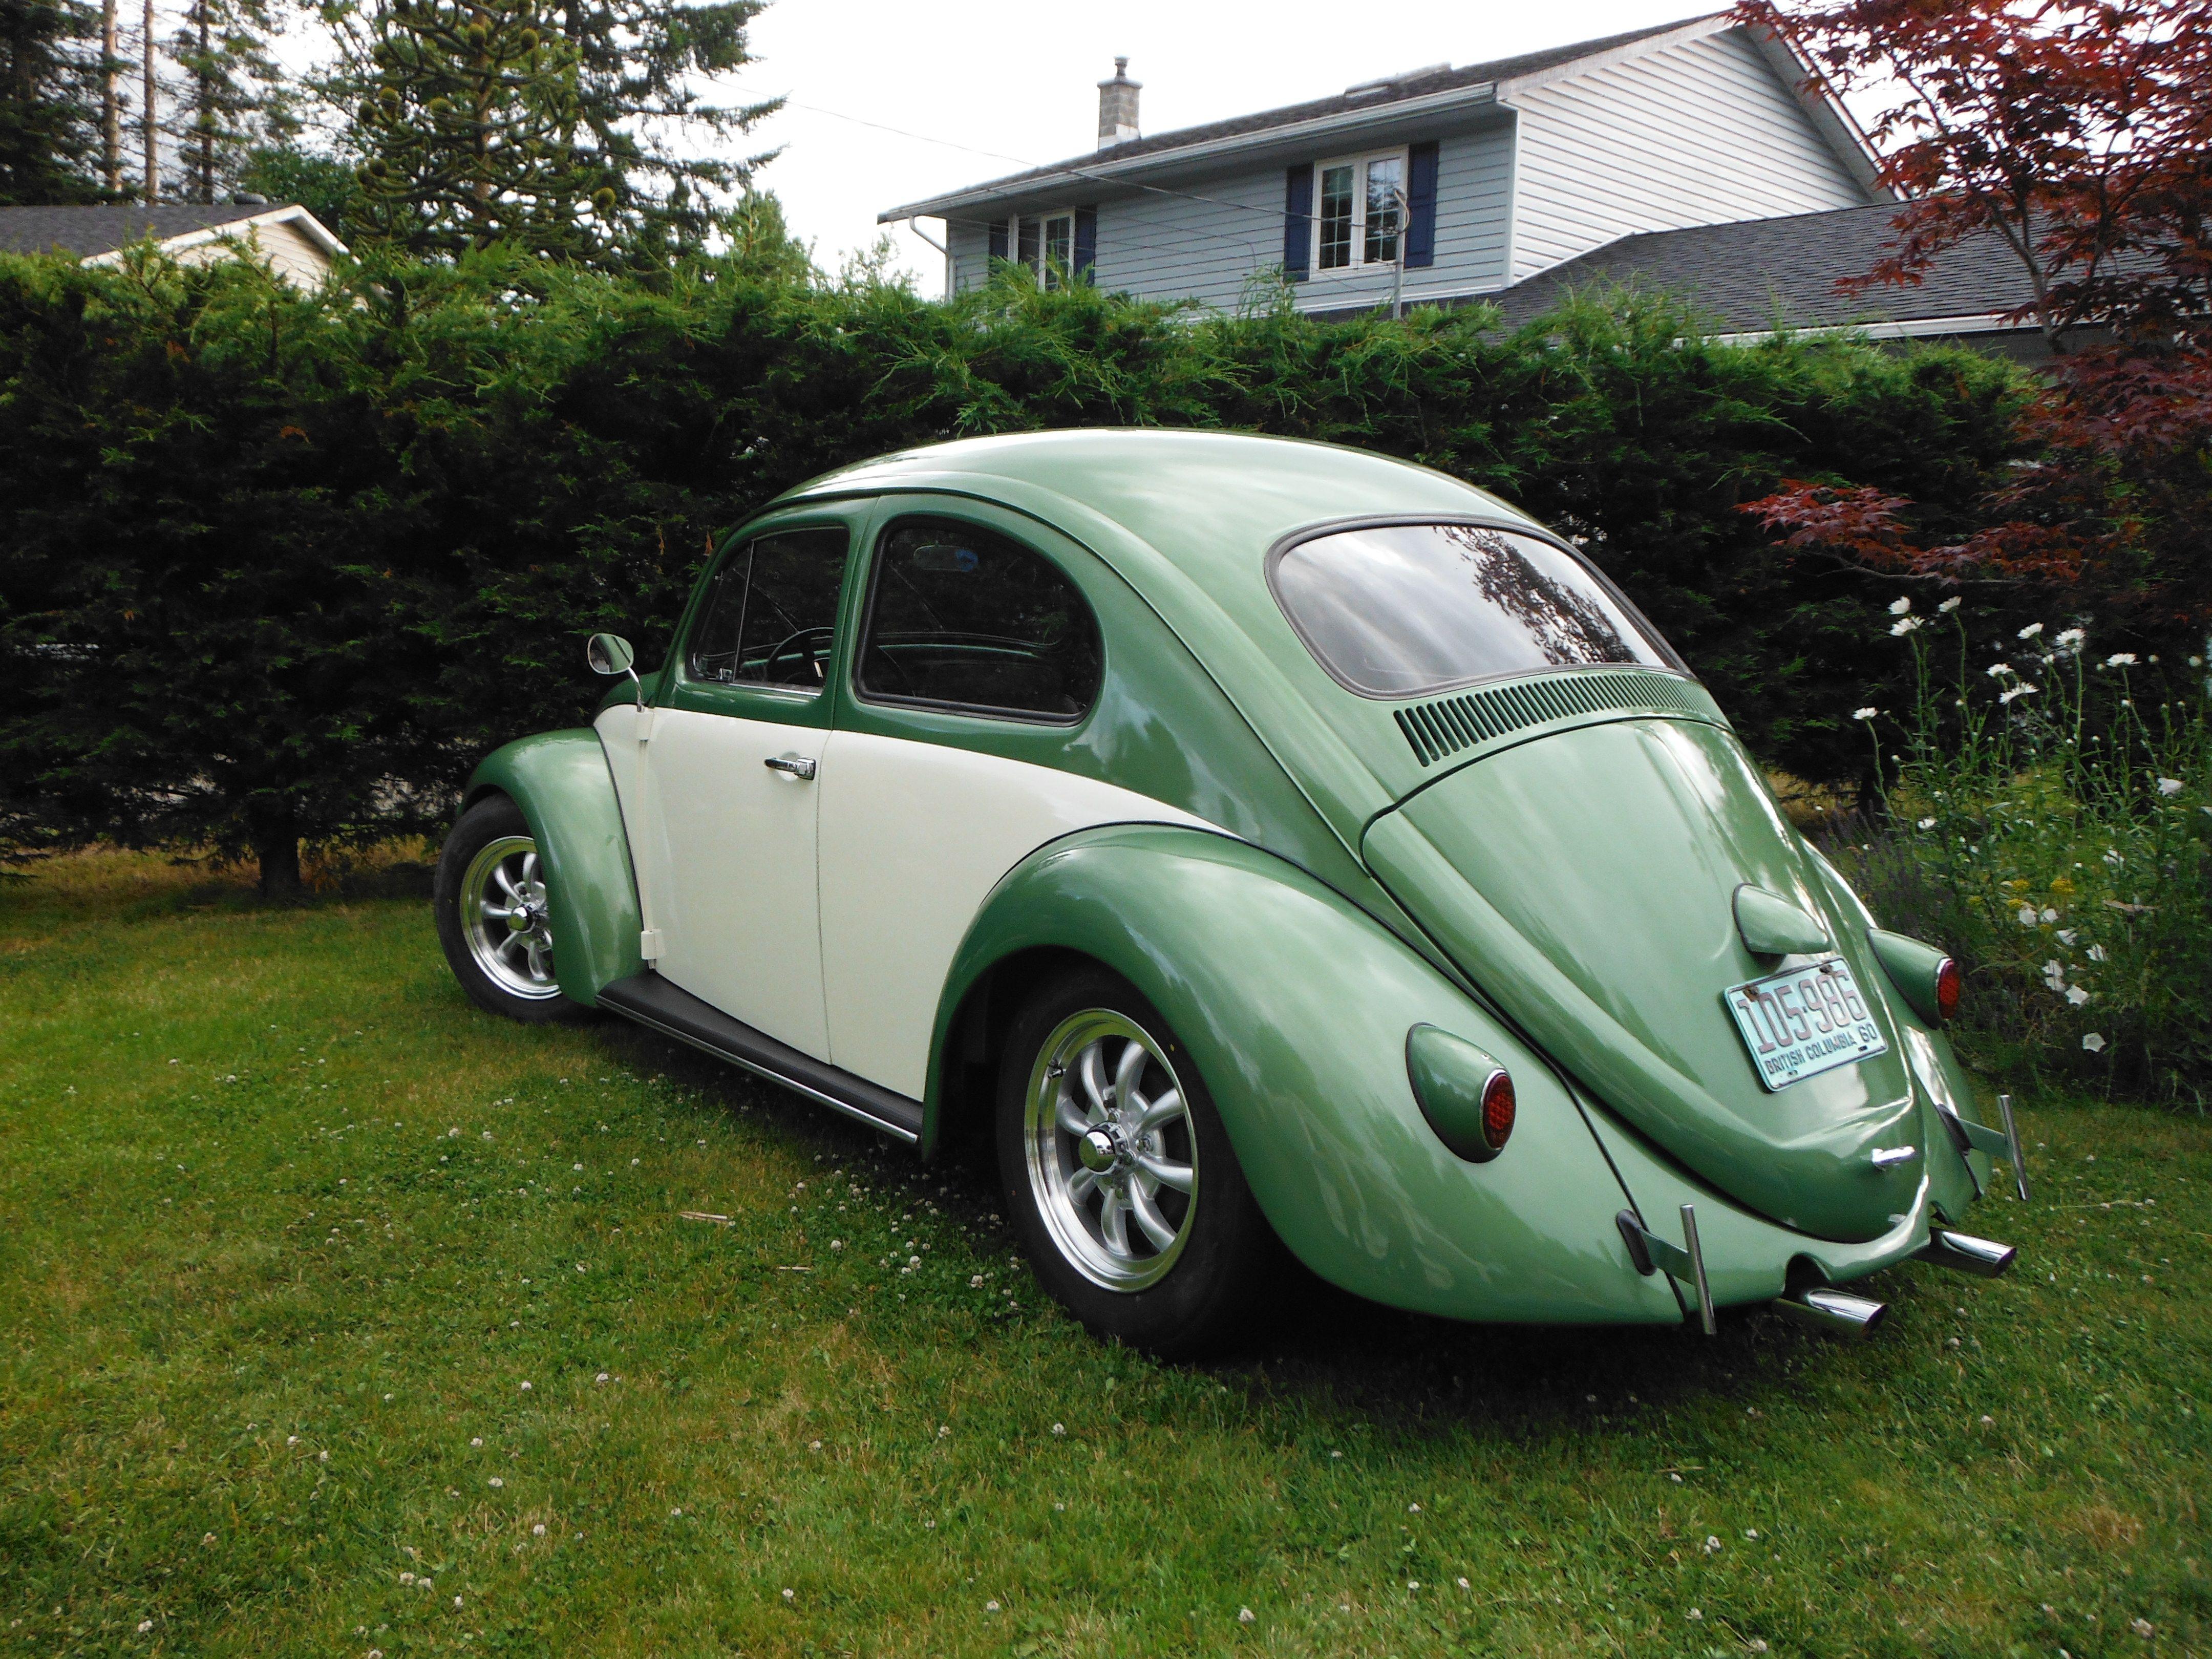 Custom Built Vw Beetle 1966 Chassis With A 1960 Body Original Glass Snowflake Rear Lights Vw Beetles Beetle Custom Build